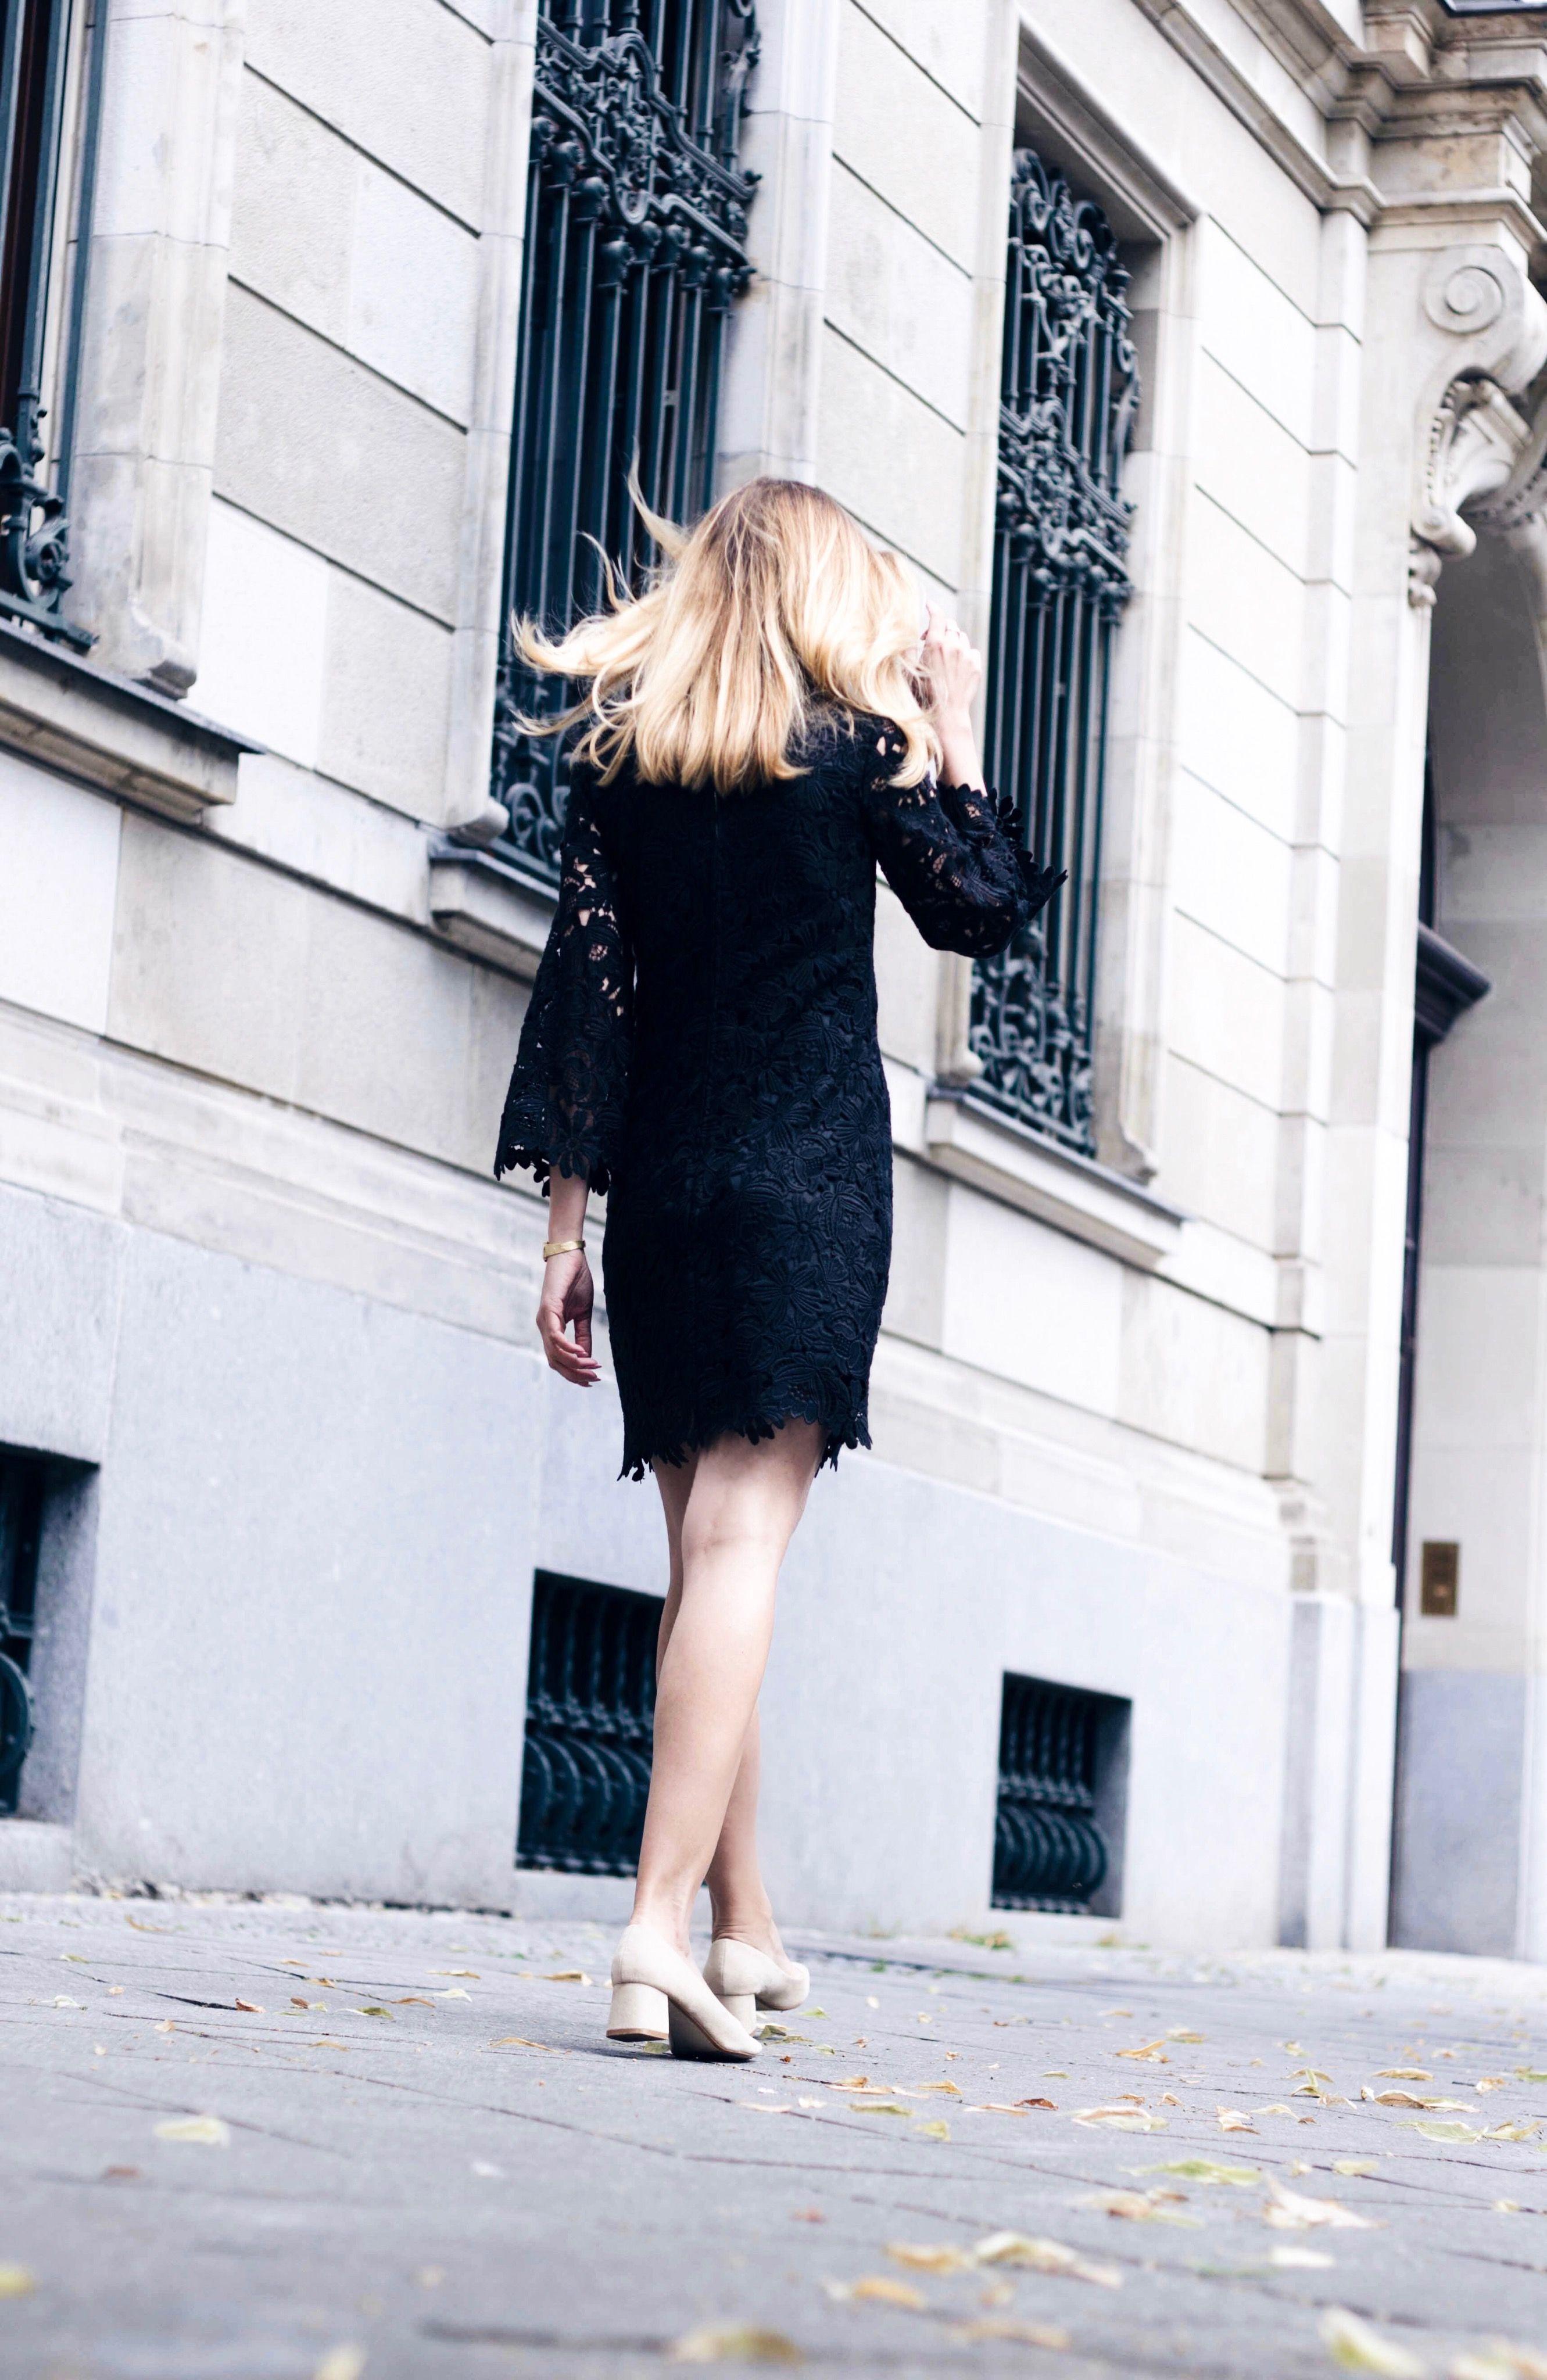 ea952974b0c OOTD - black crochet dress from & other stories. www.louisa-maureen ...